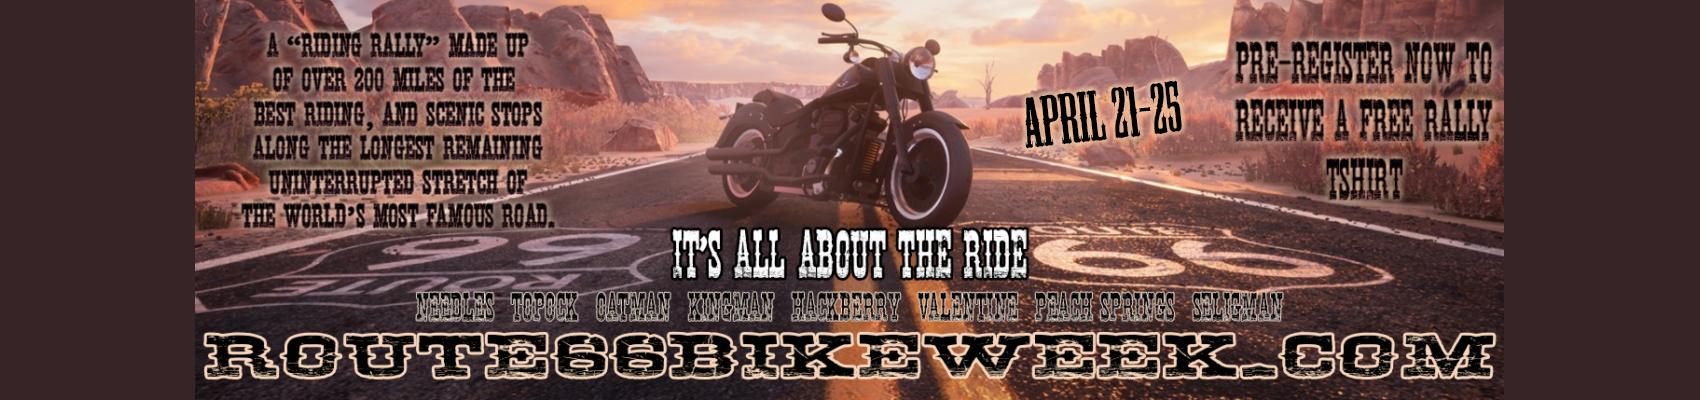 Route 66 Bike Week